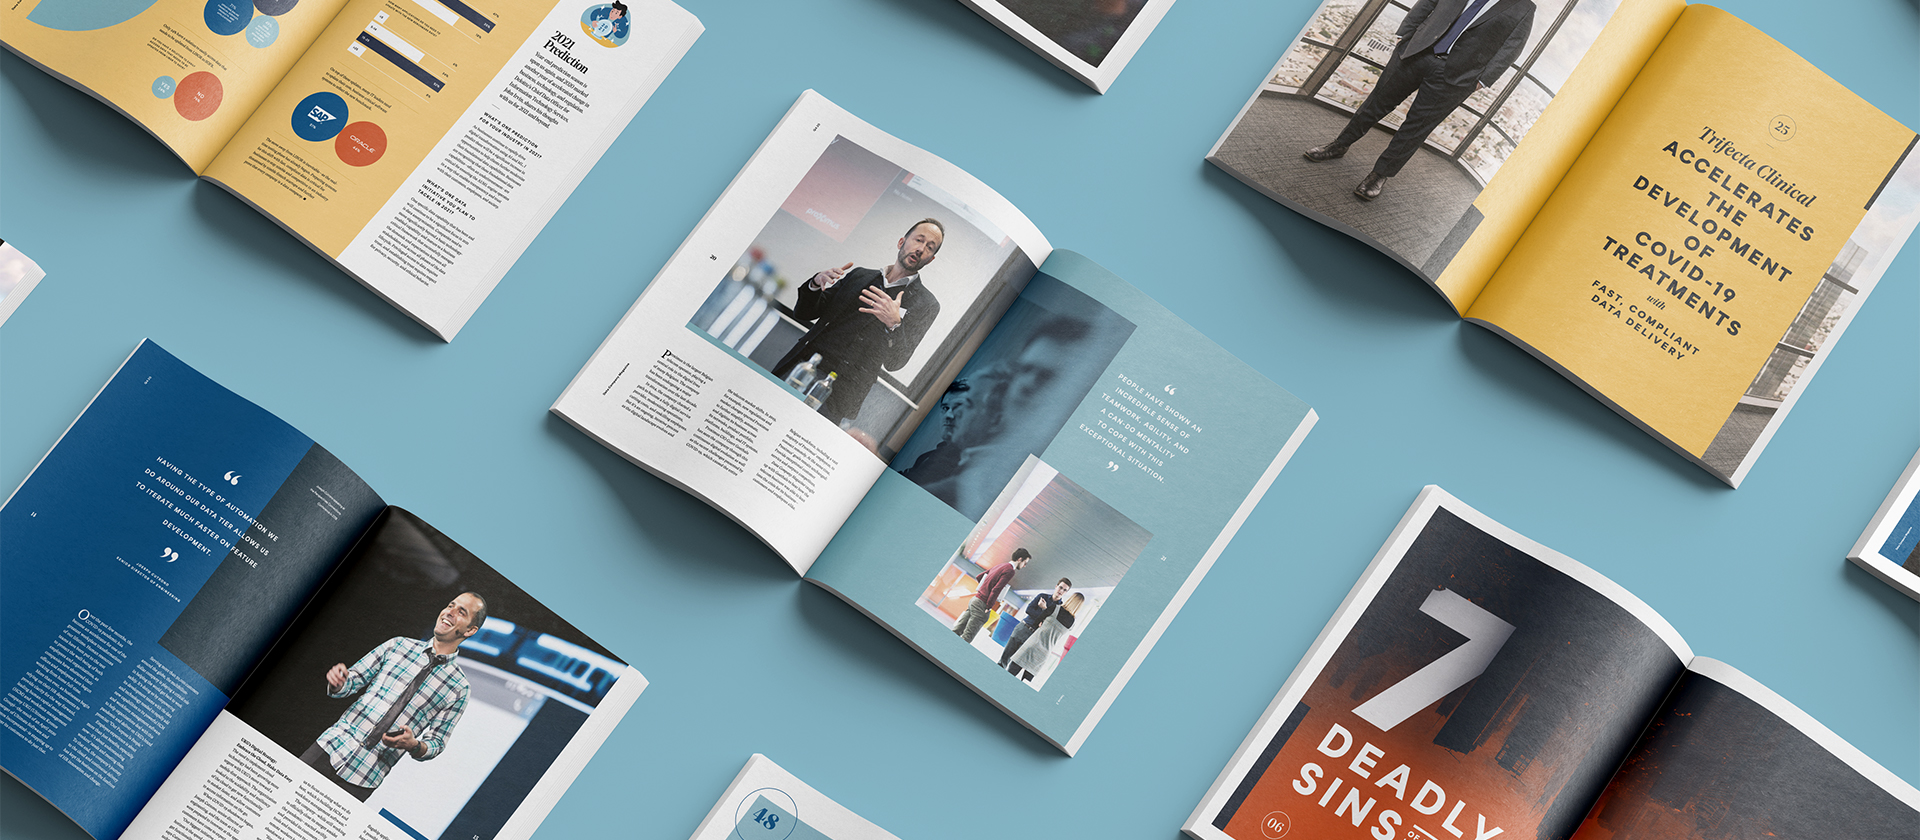 5 Must-Read Digital Innovation Stories—Inside Data Company Magazine